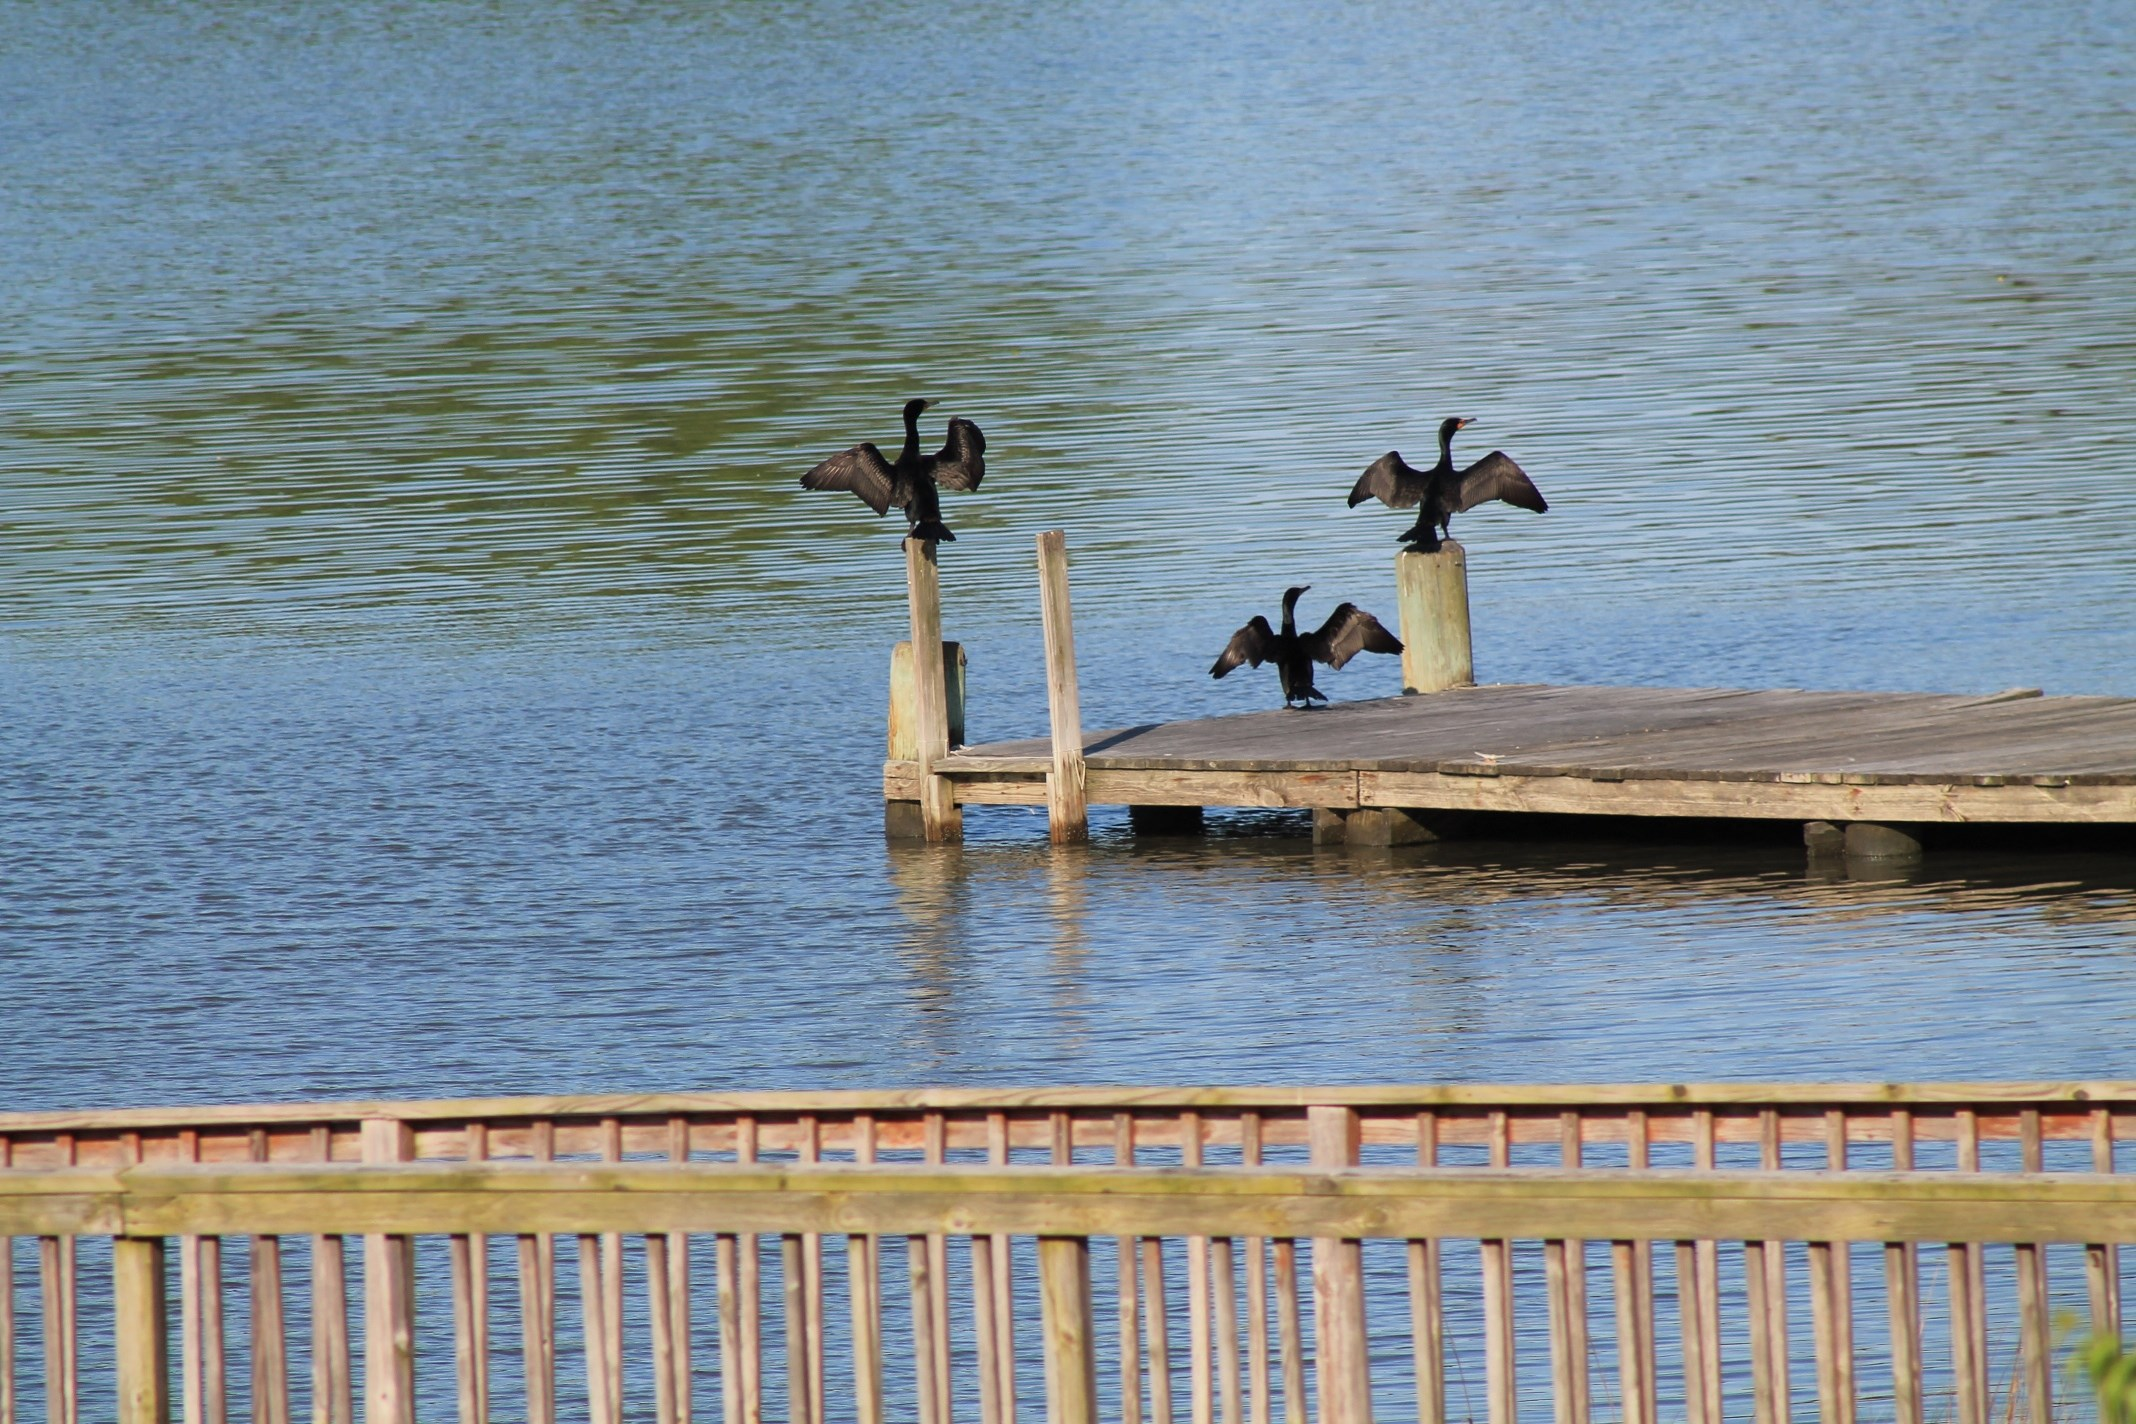 Cormorants on the Fishing Pier!